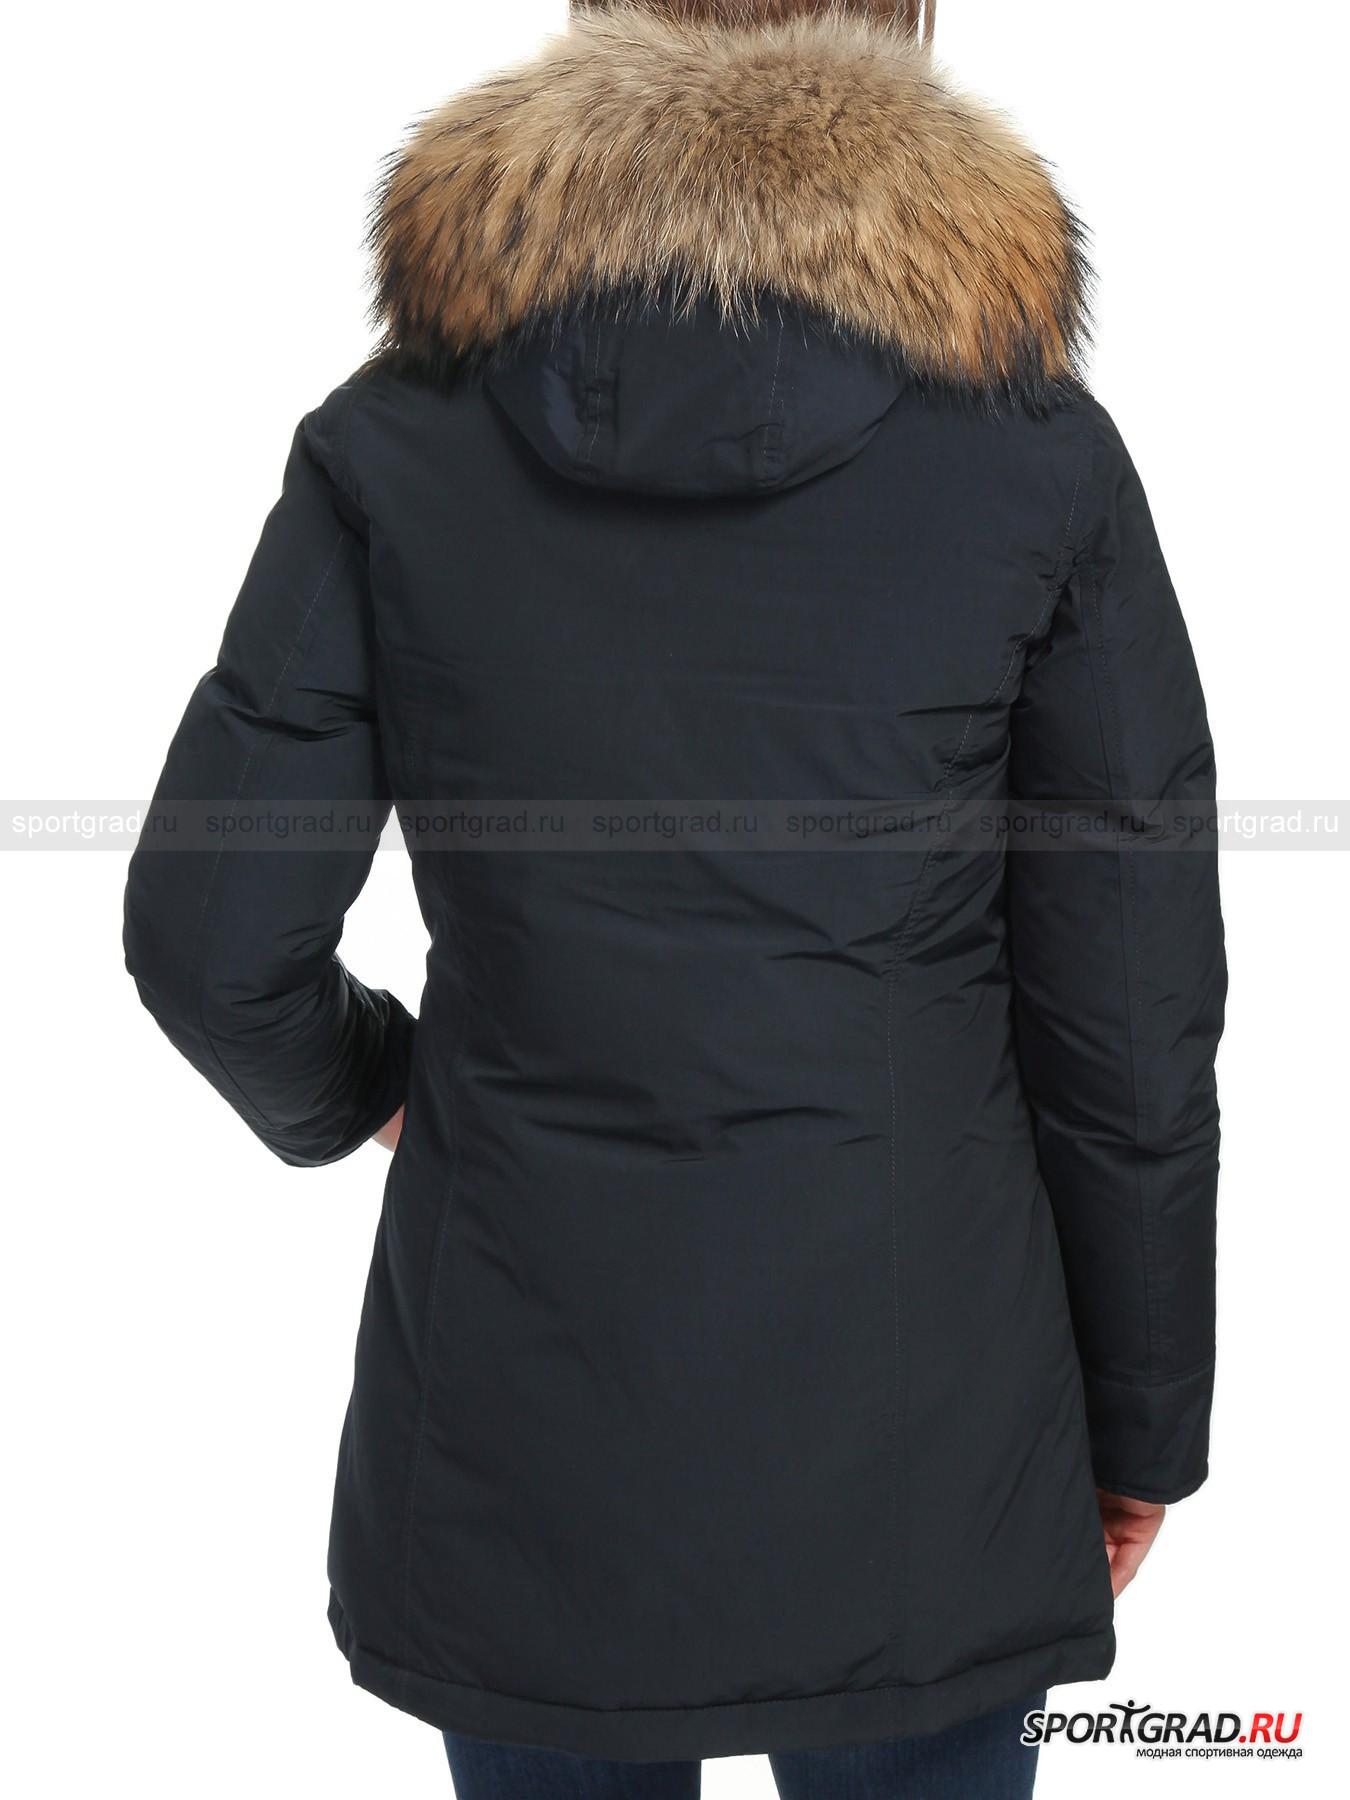 Пуховик женский  LUXURY ARCTIC PARKA WOOLRICH от Спортград